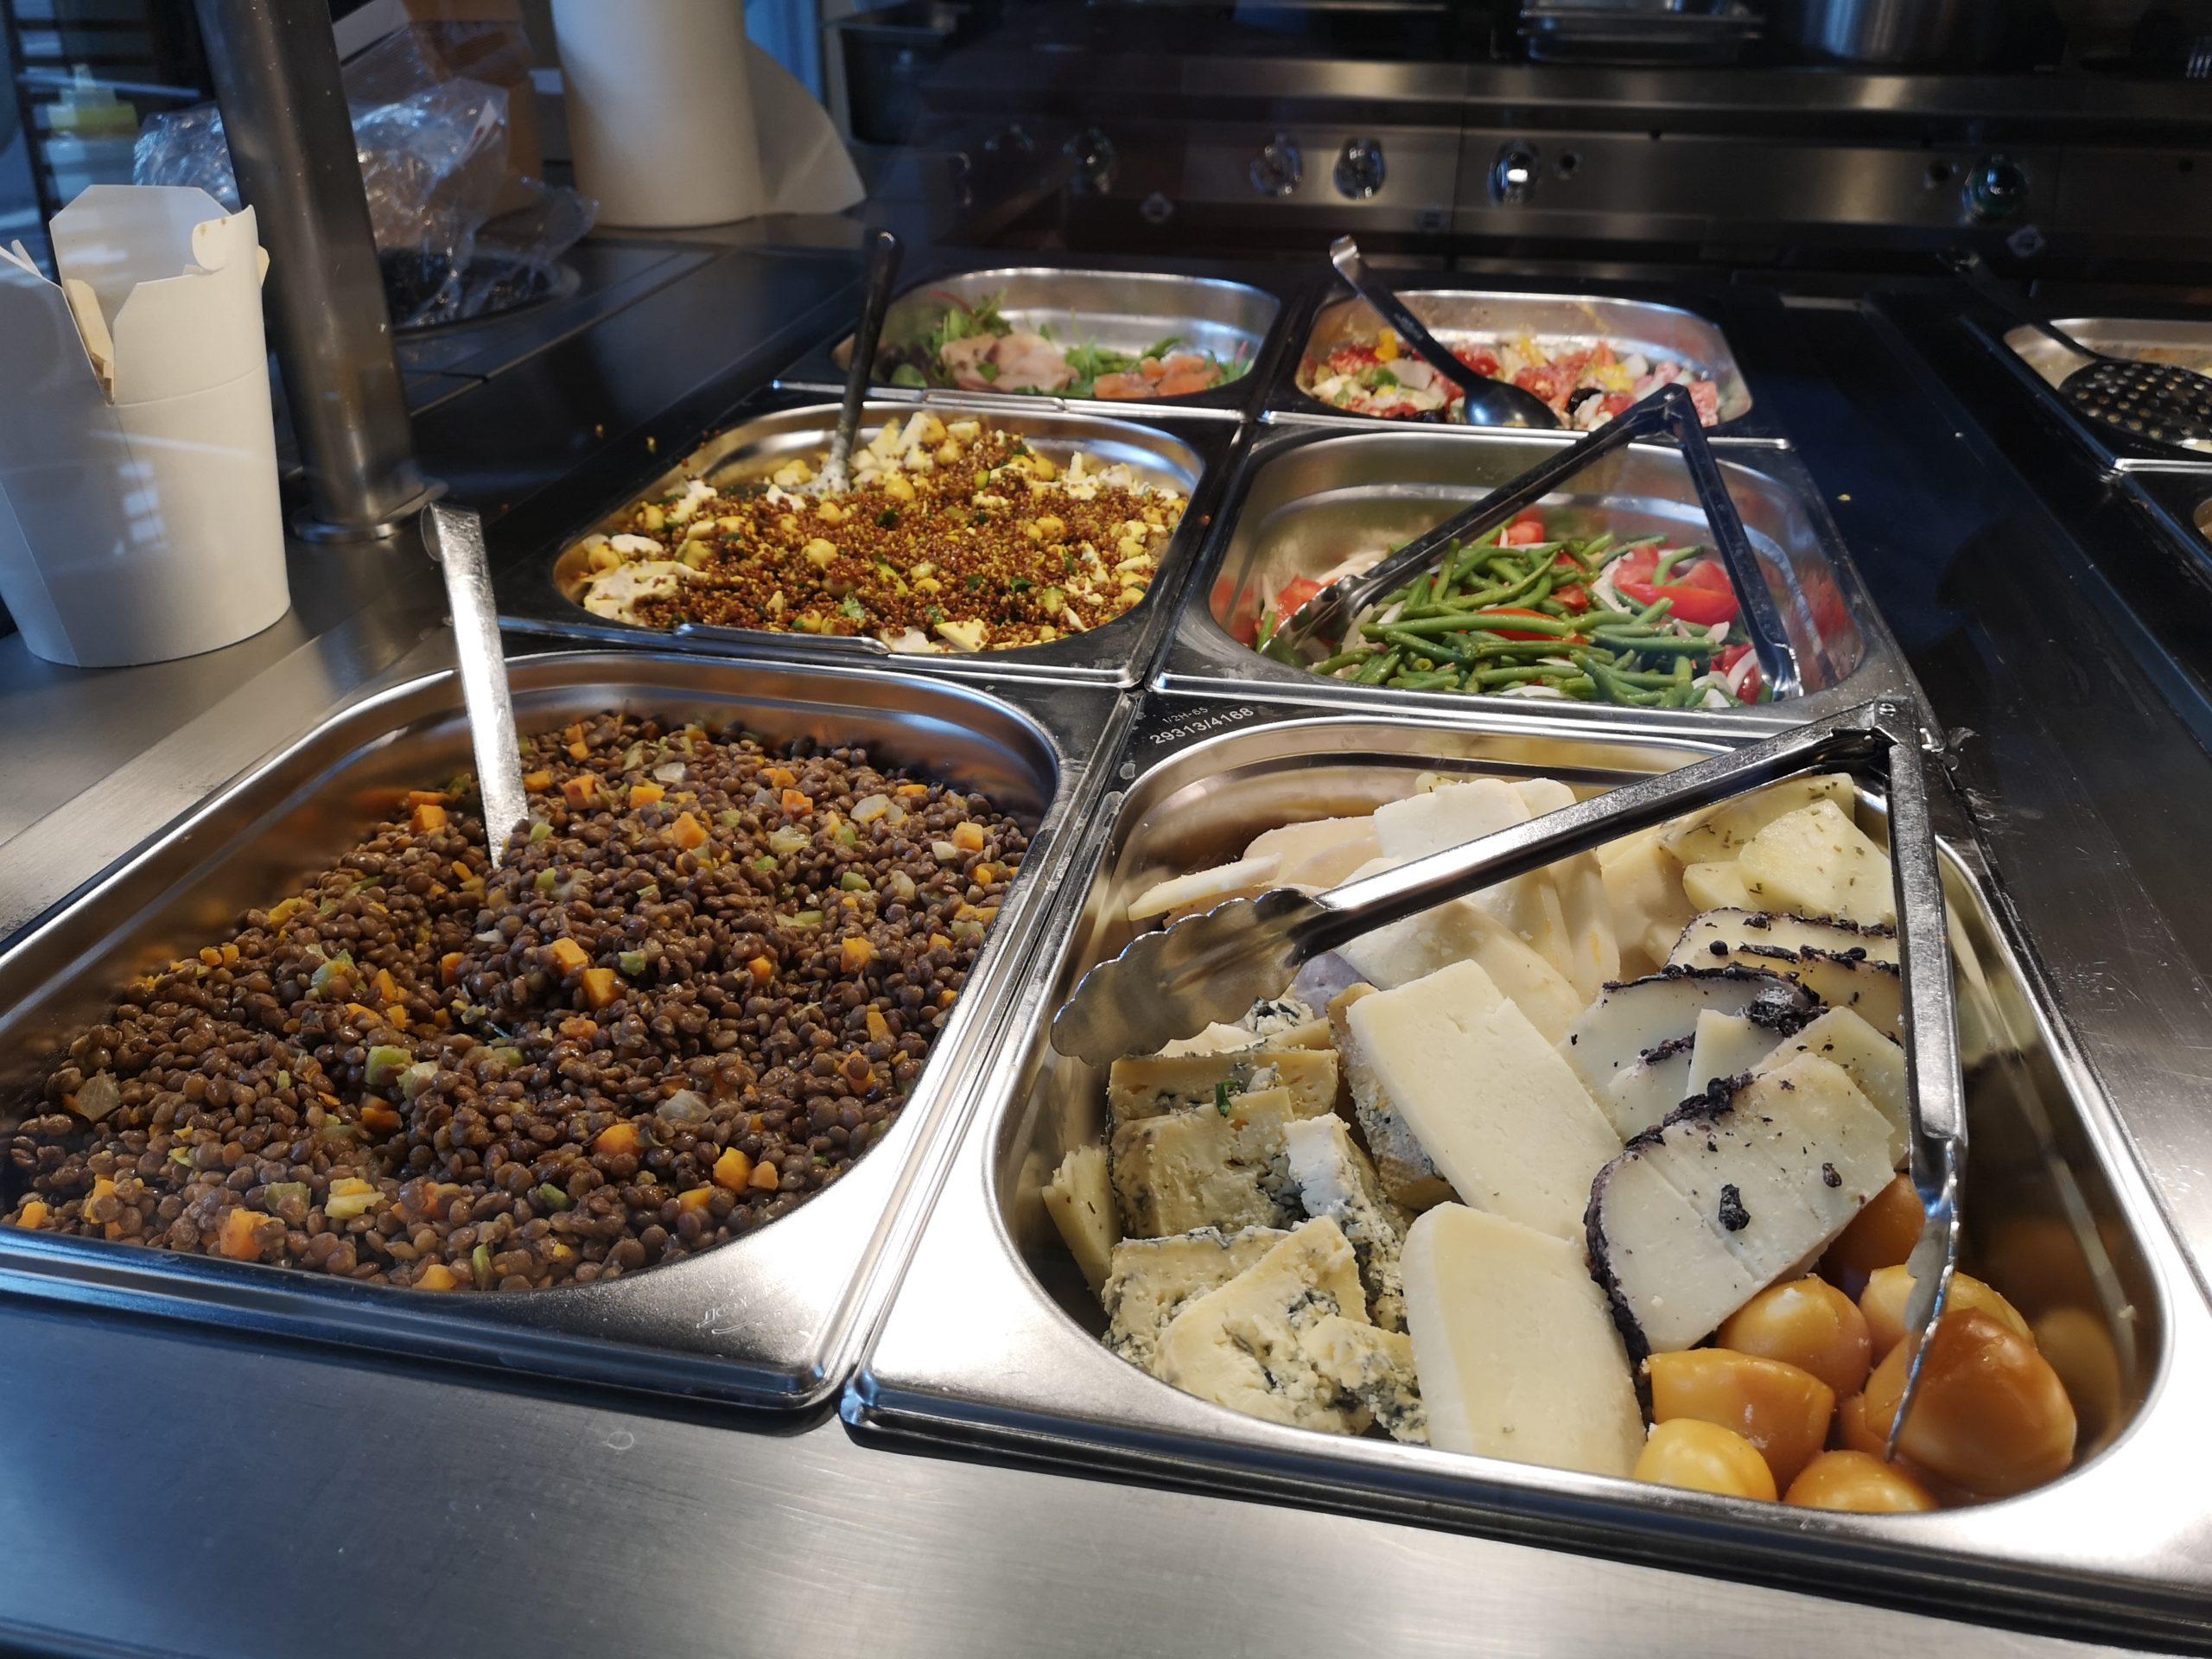 La Focacceria Restaurant Traiteur Delivery take Away Luxembourg Come a la Maison 2